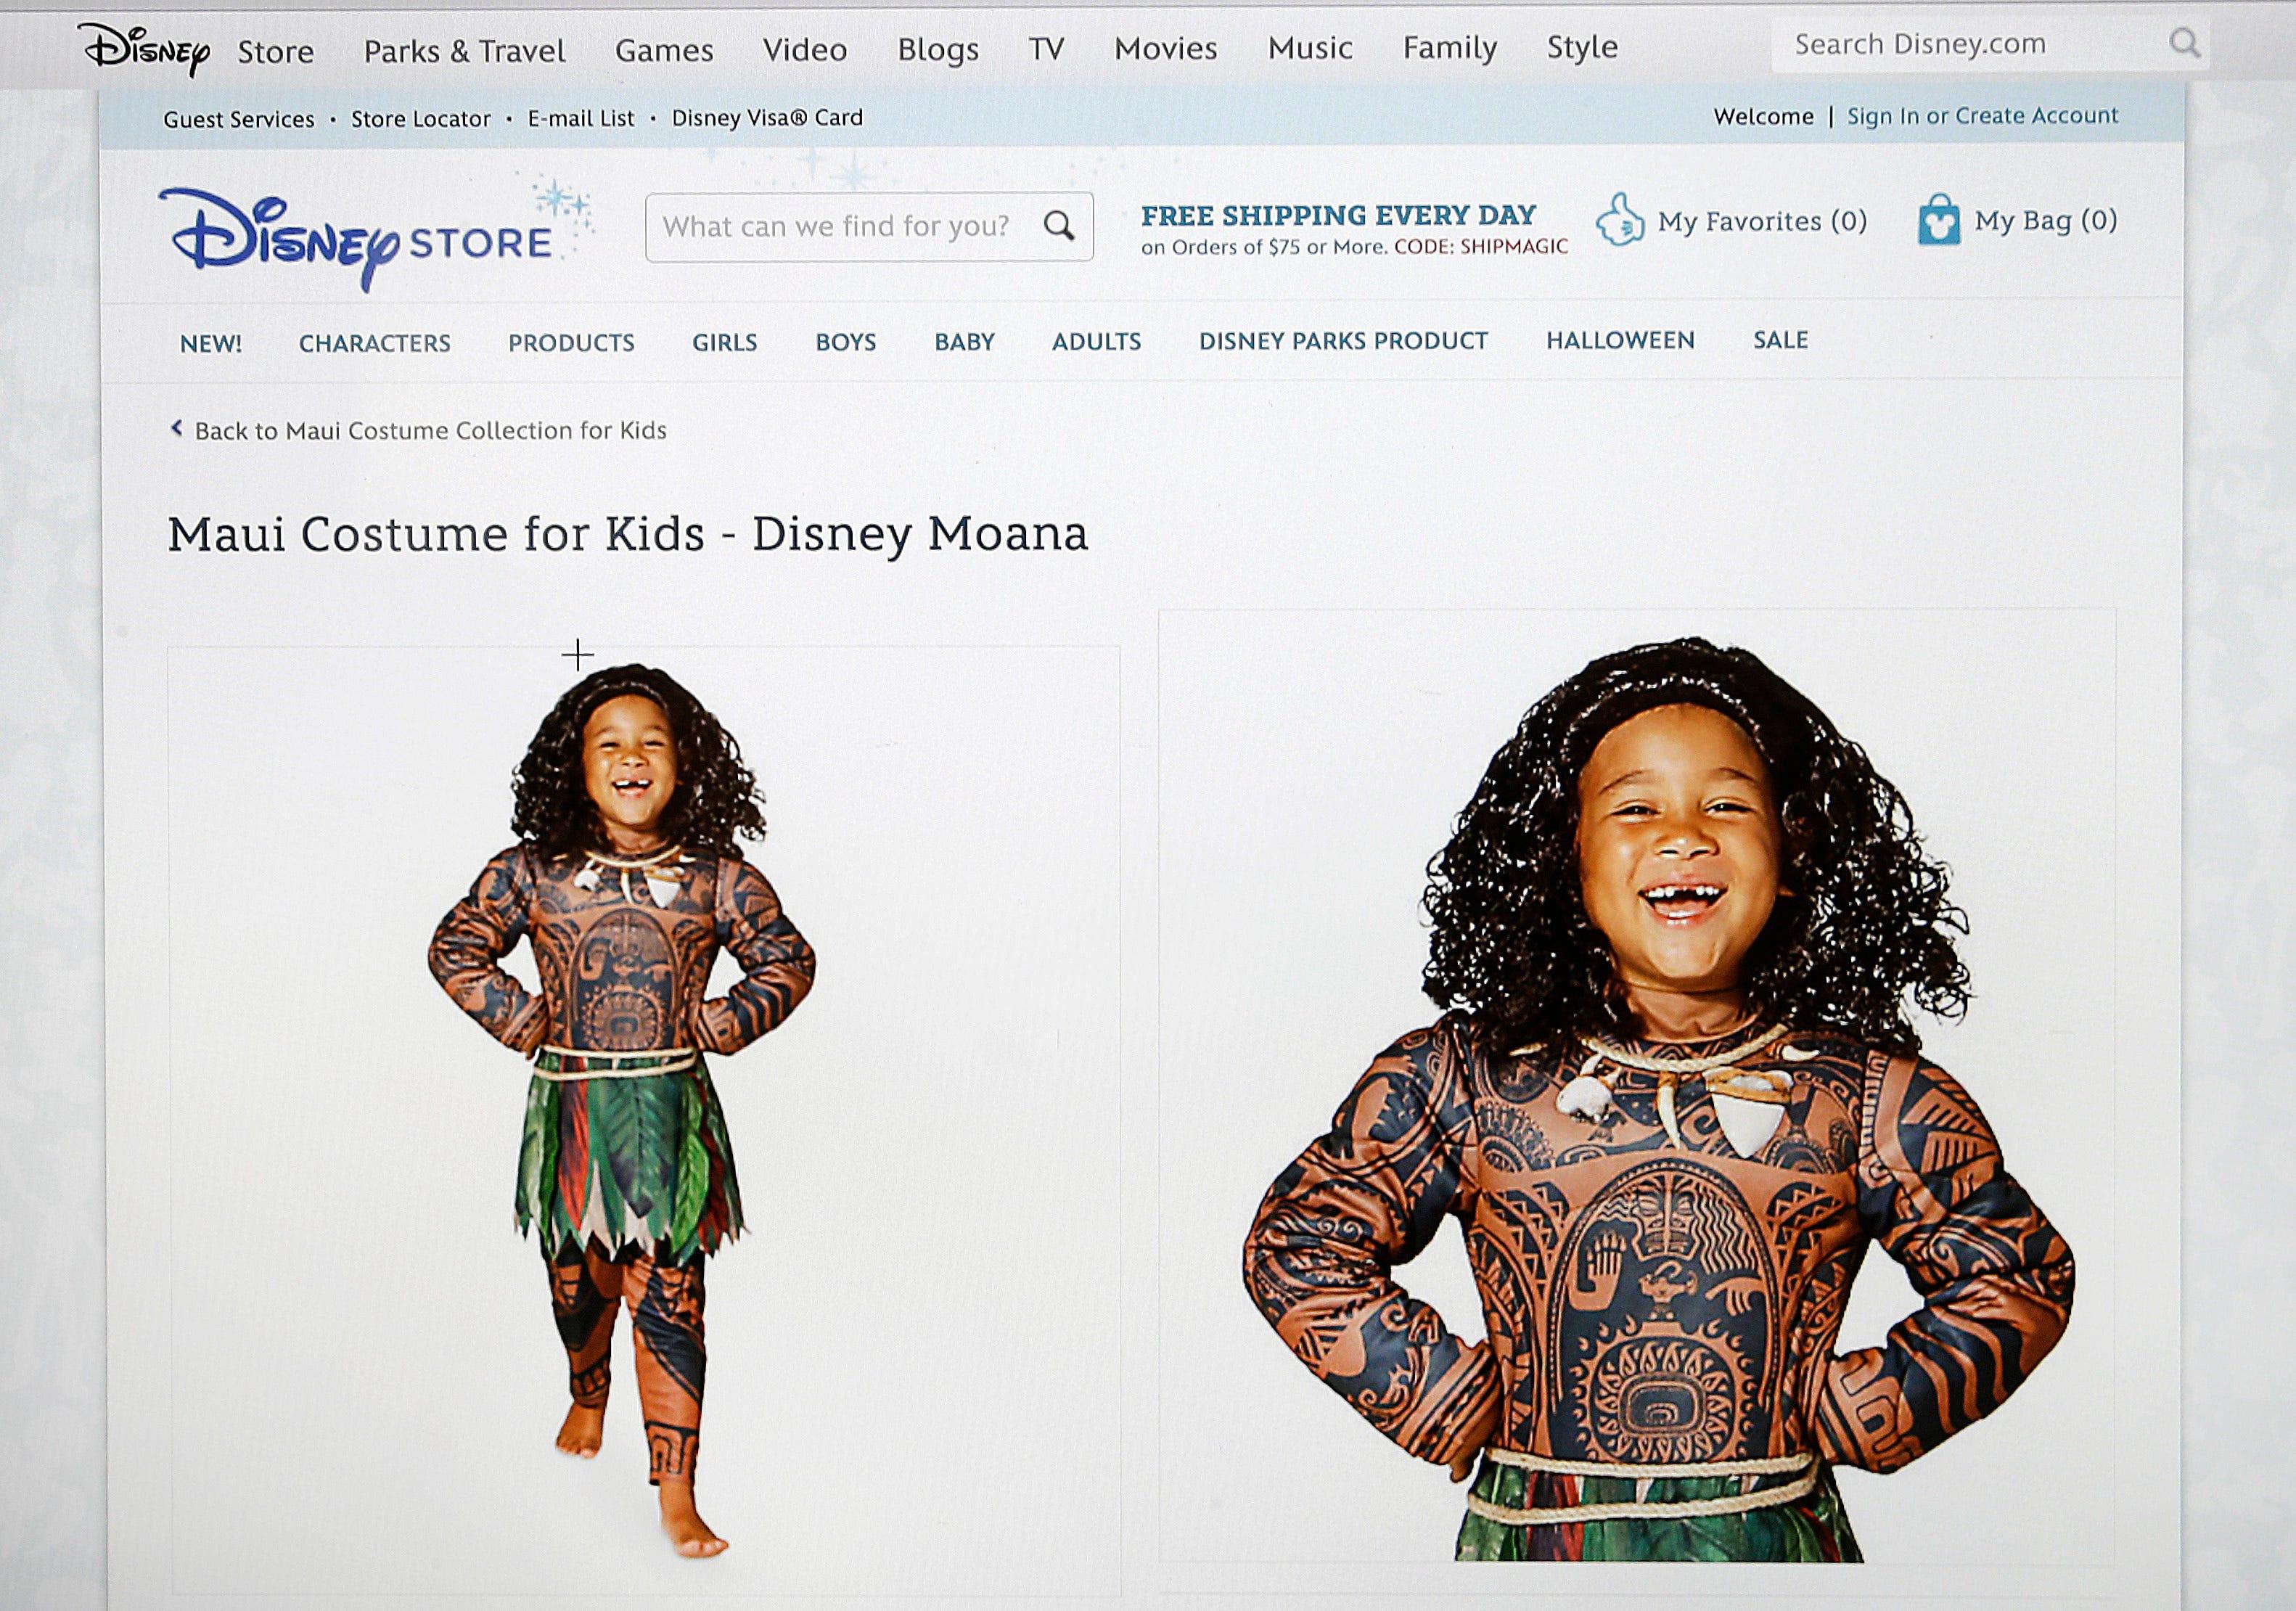 sc 1 st  USA Today & Disney pulls offensive u0027Moanau0027 Halloween costume